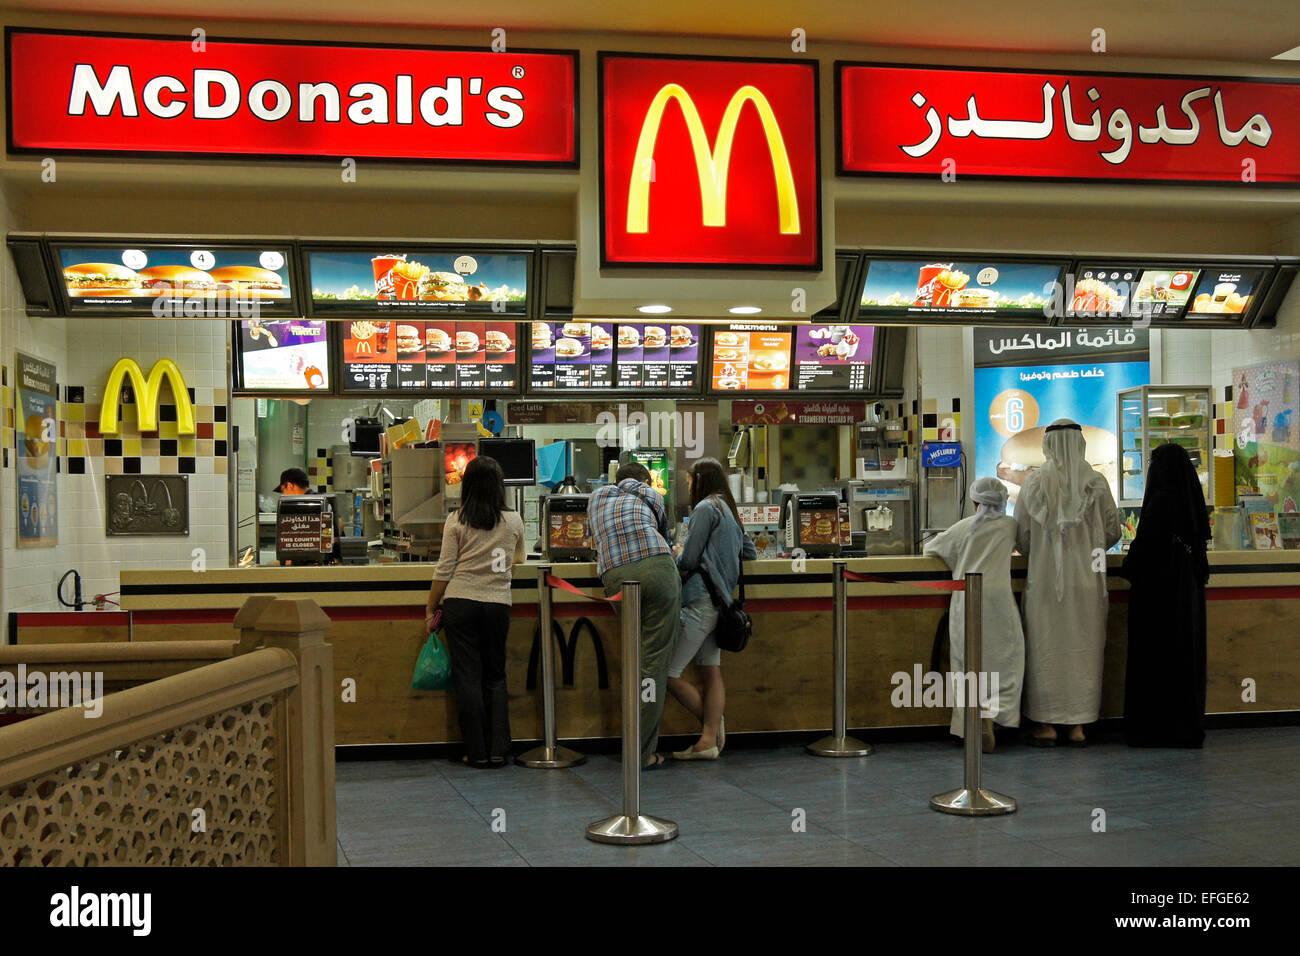 McDonald's in mall in Ras al-Khaimah, United Arab Emirates - Stock Image